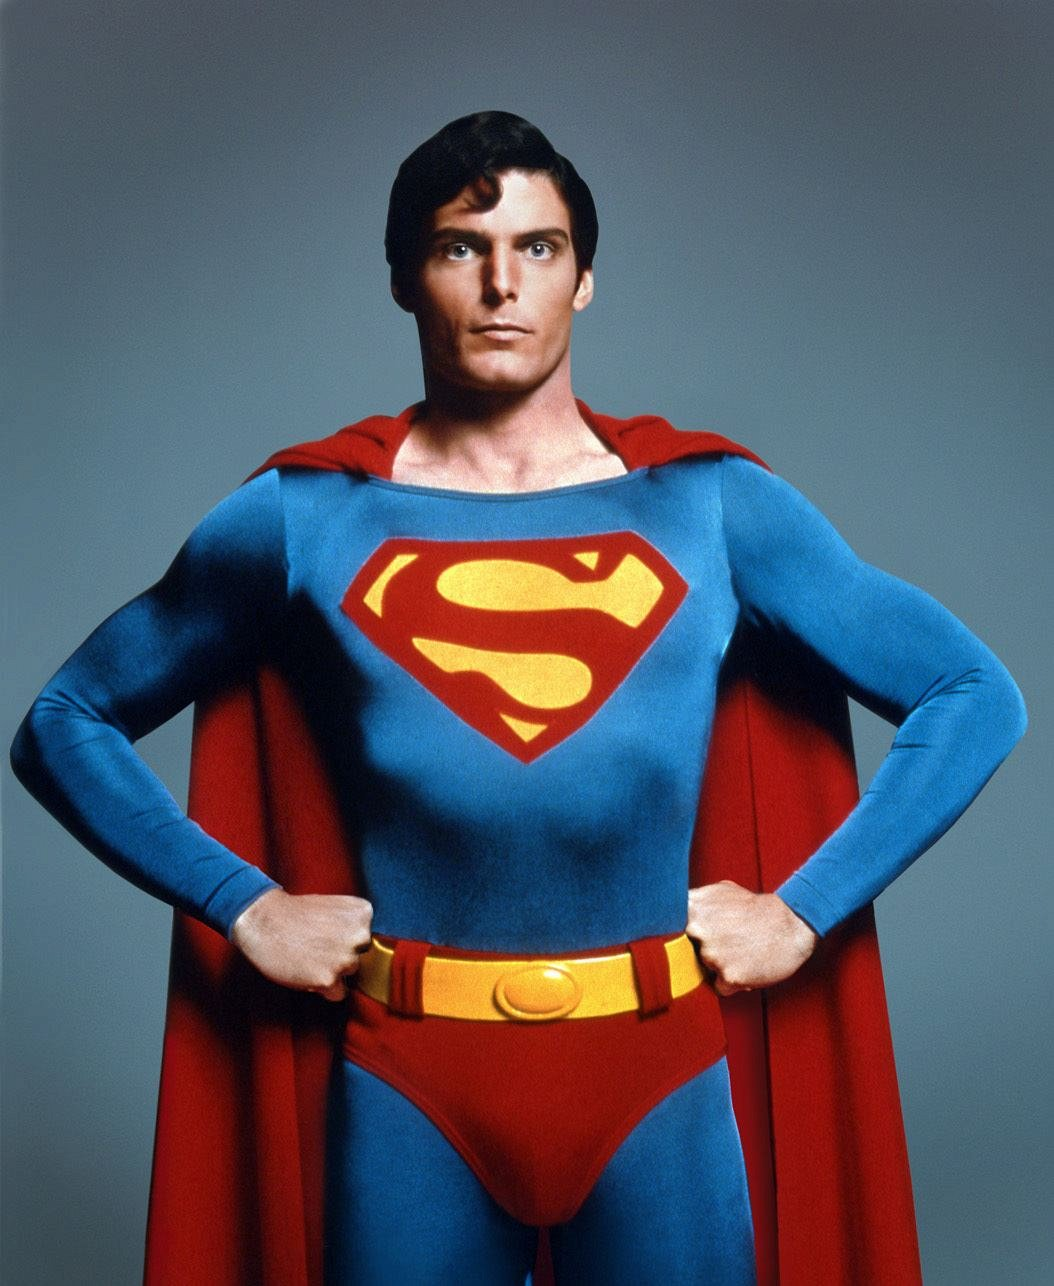 publicity-photo-superman-the-movie-20409106-1054-1_8zn8.1920-1464375115.jpg